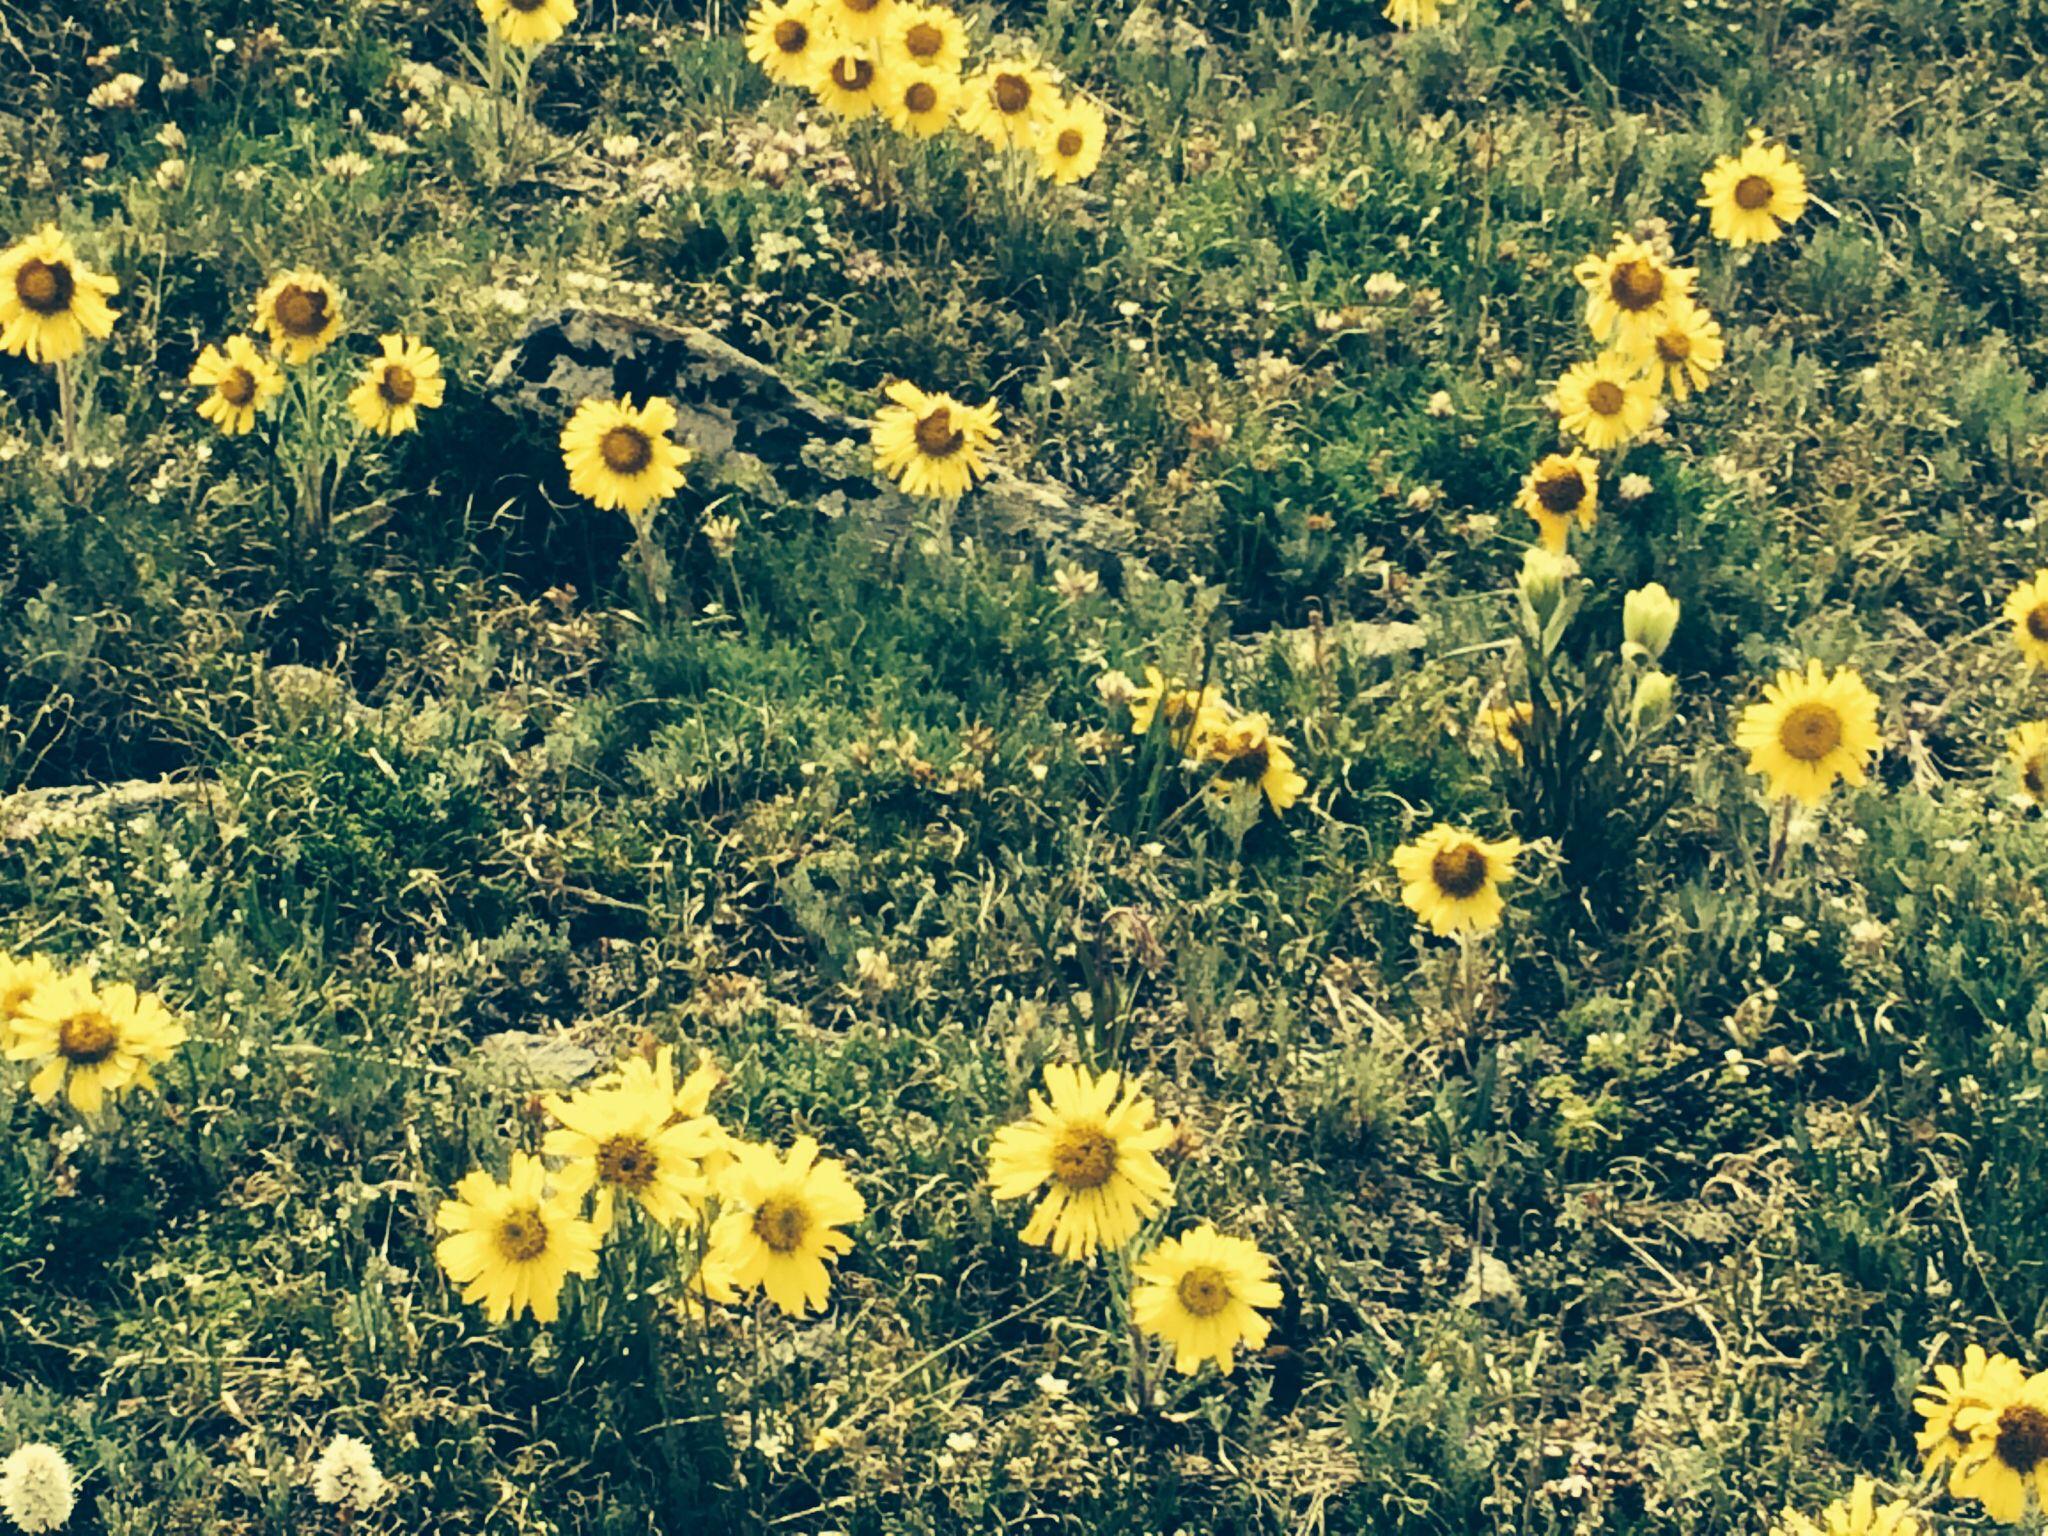 Wild yellow flowers buena vista colorado wild flowers pinterest wild yellow flowers buena vista colorado mightylinksfo